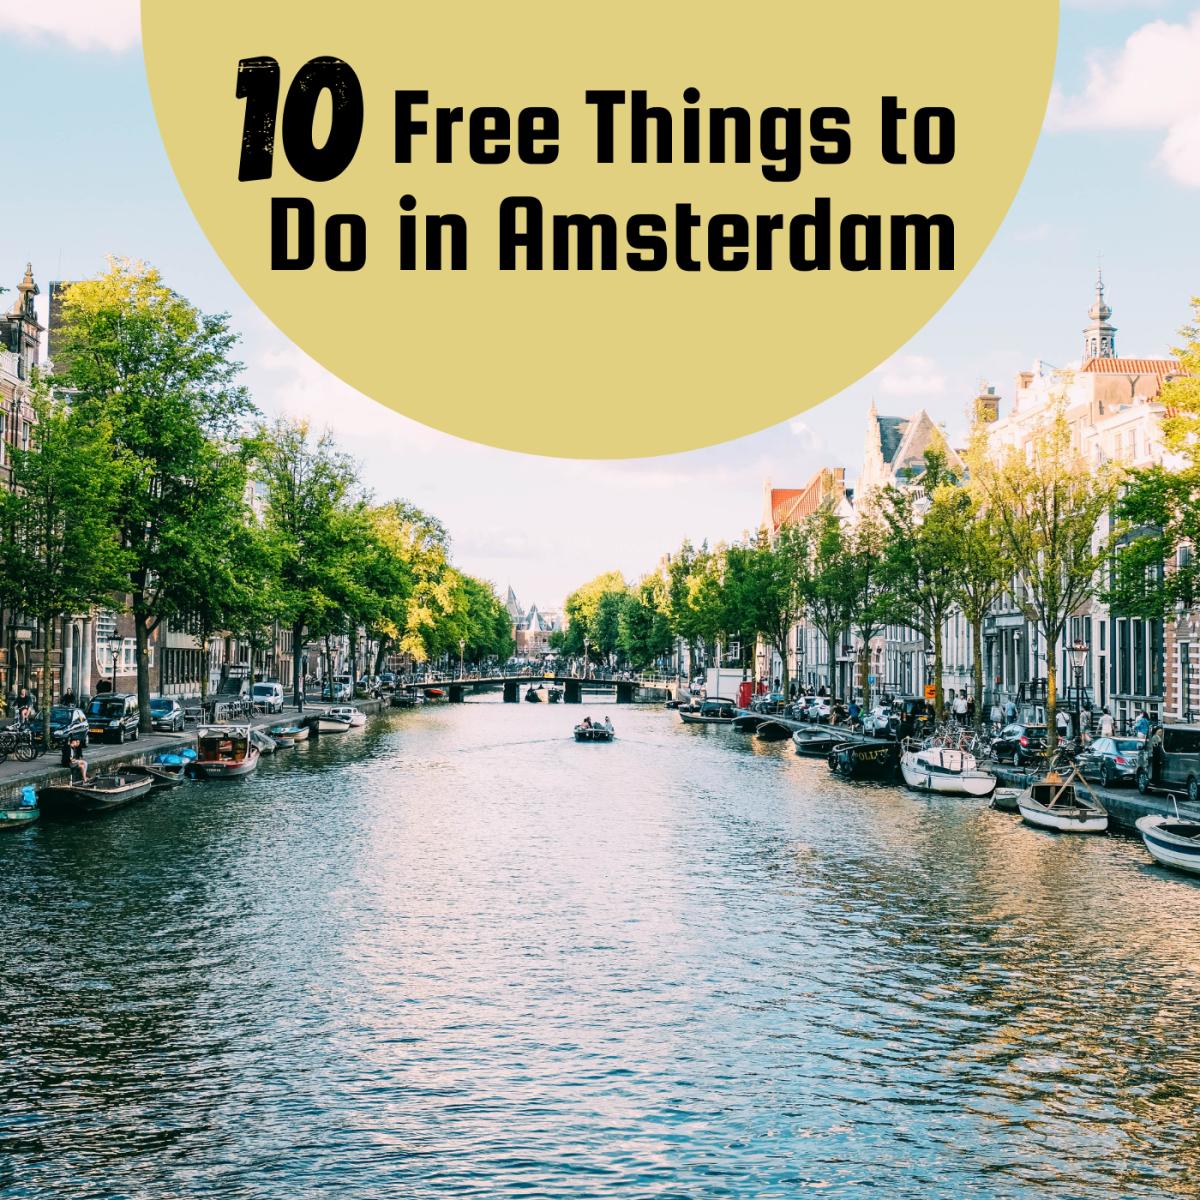 Free activites in Amsterdam